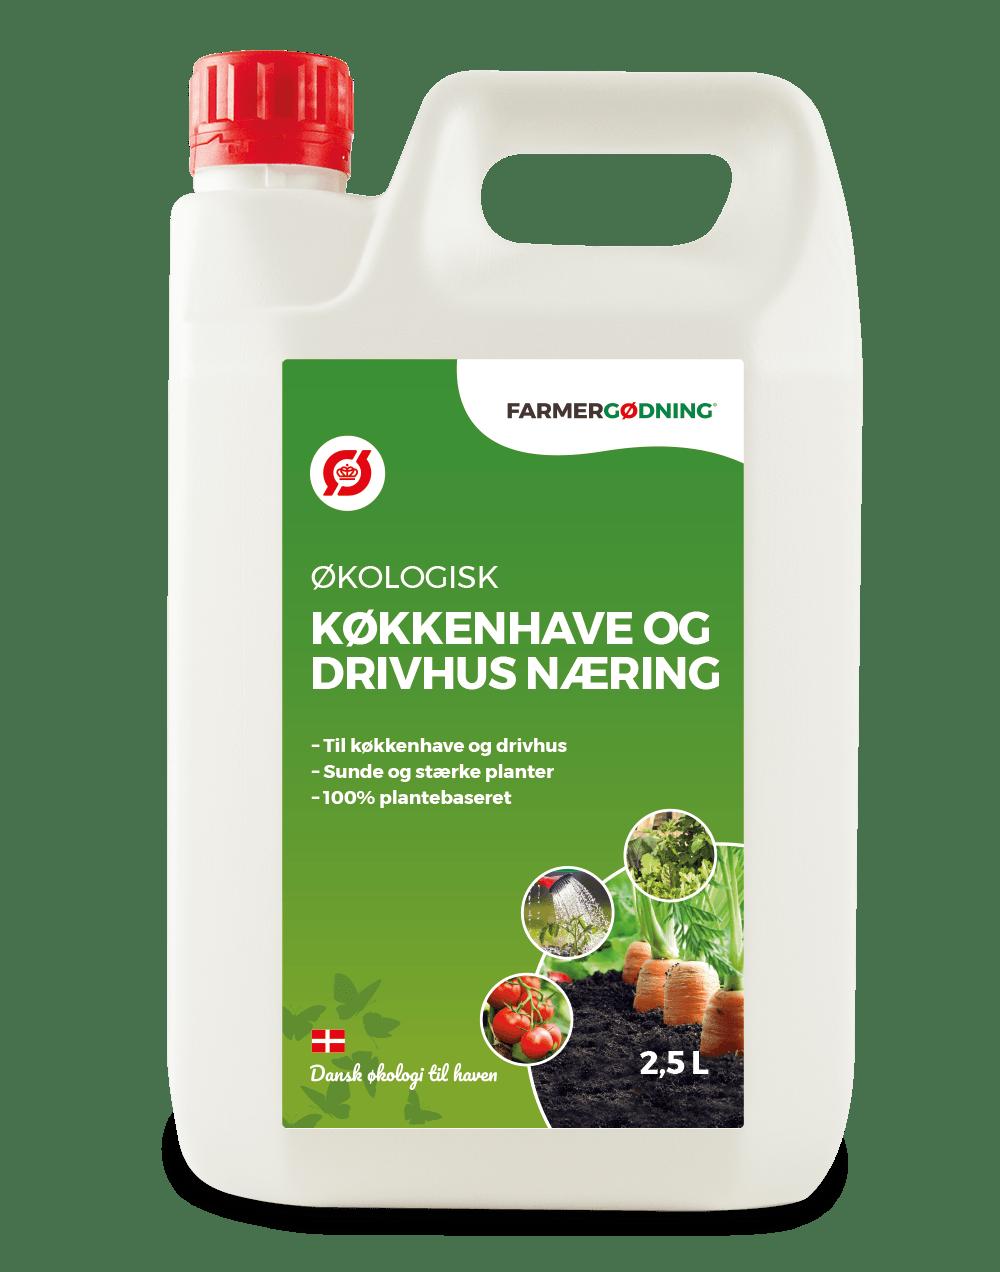 Økologisk Køkkenhave- og drivhusnæring - 2,5 liter